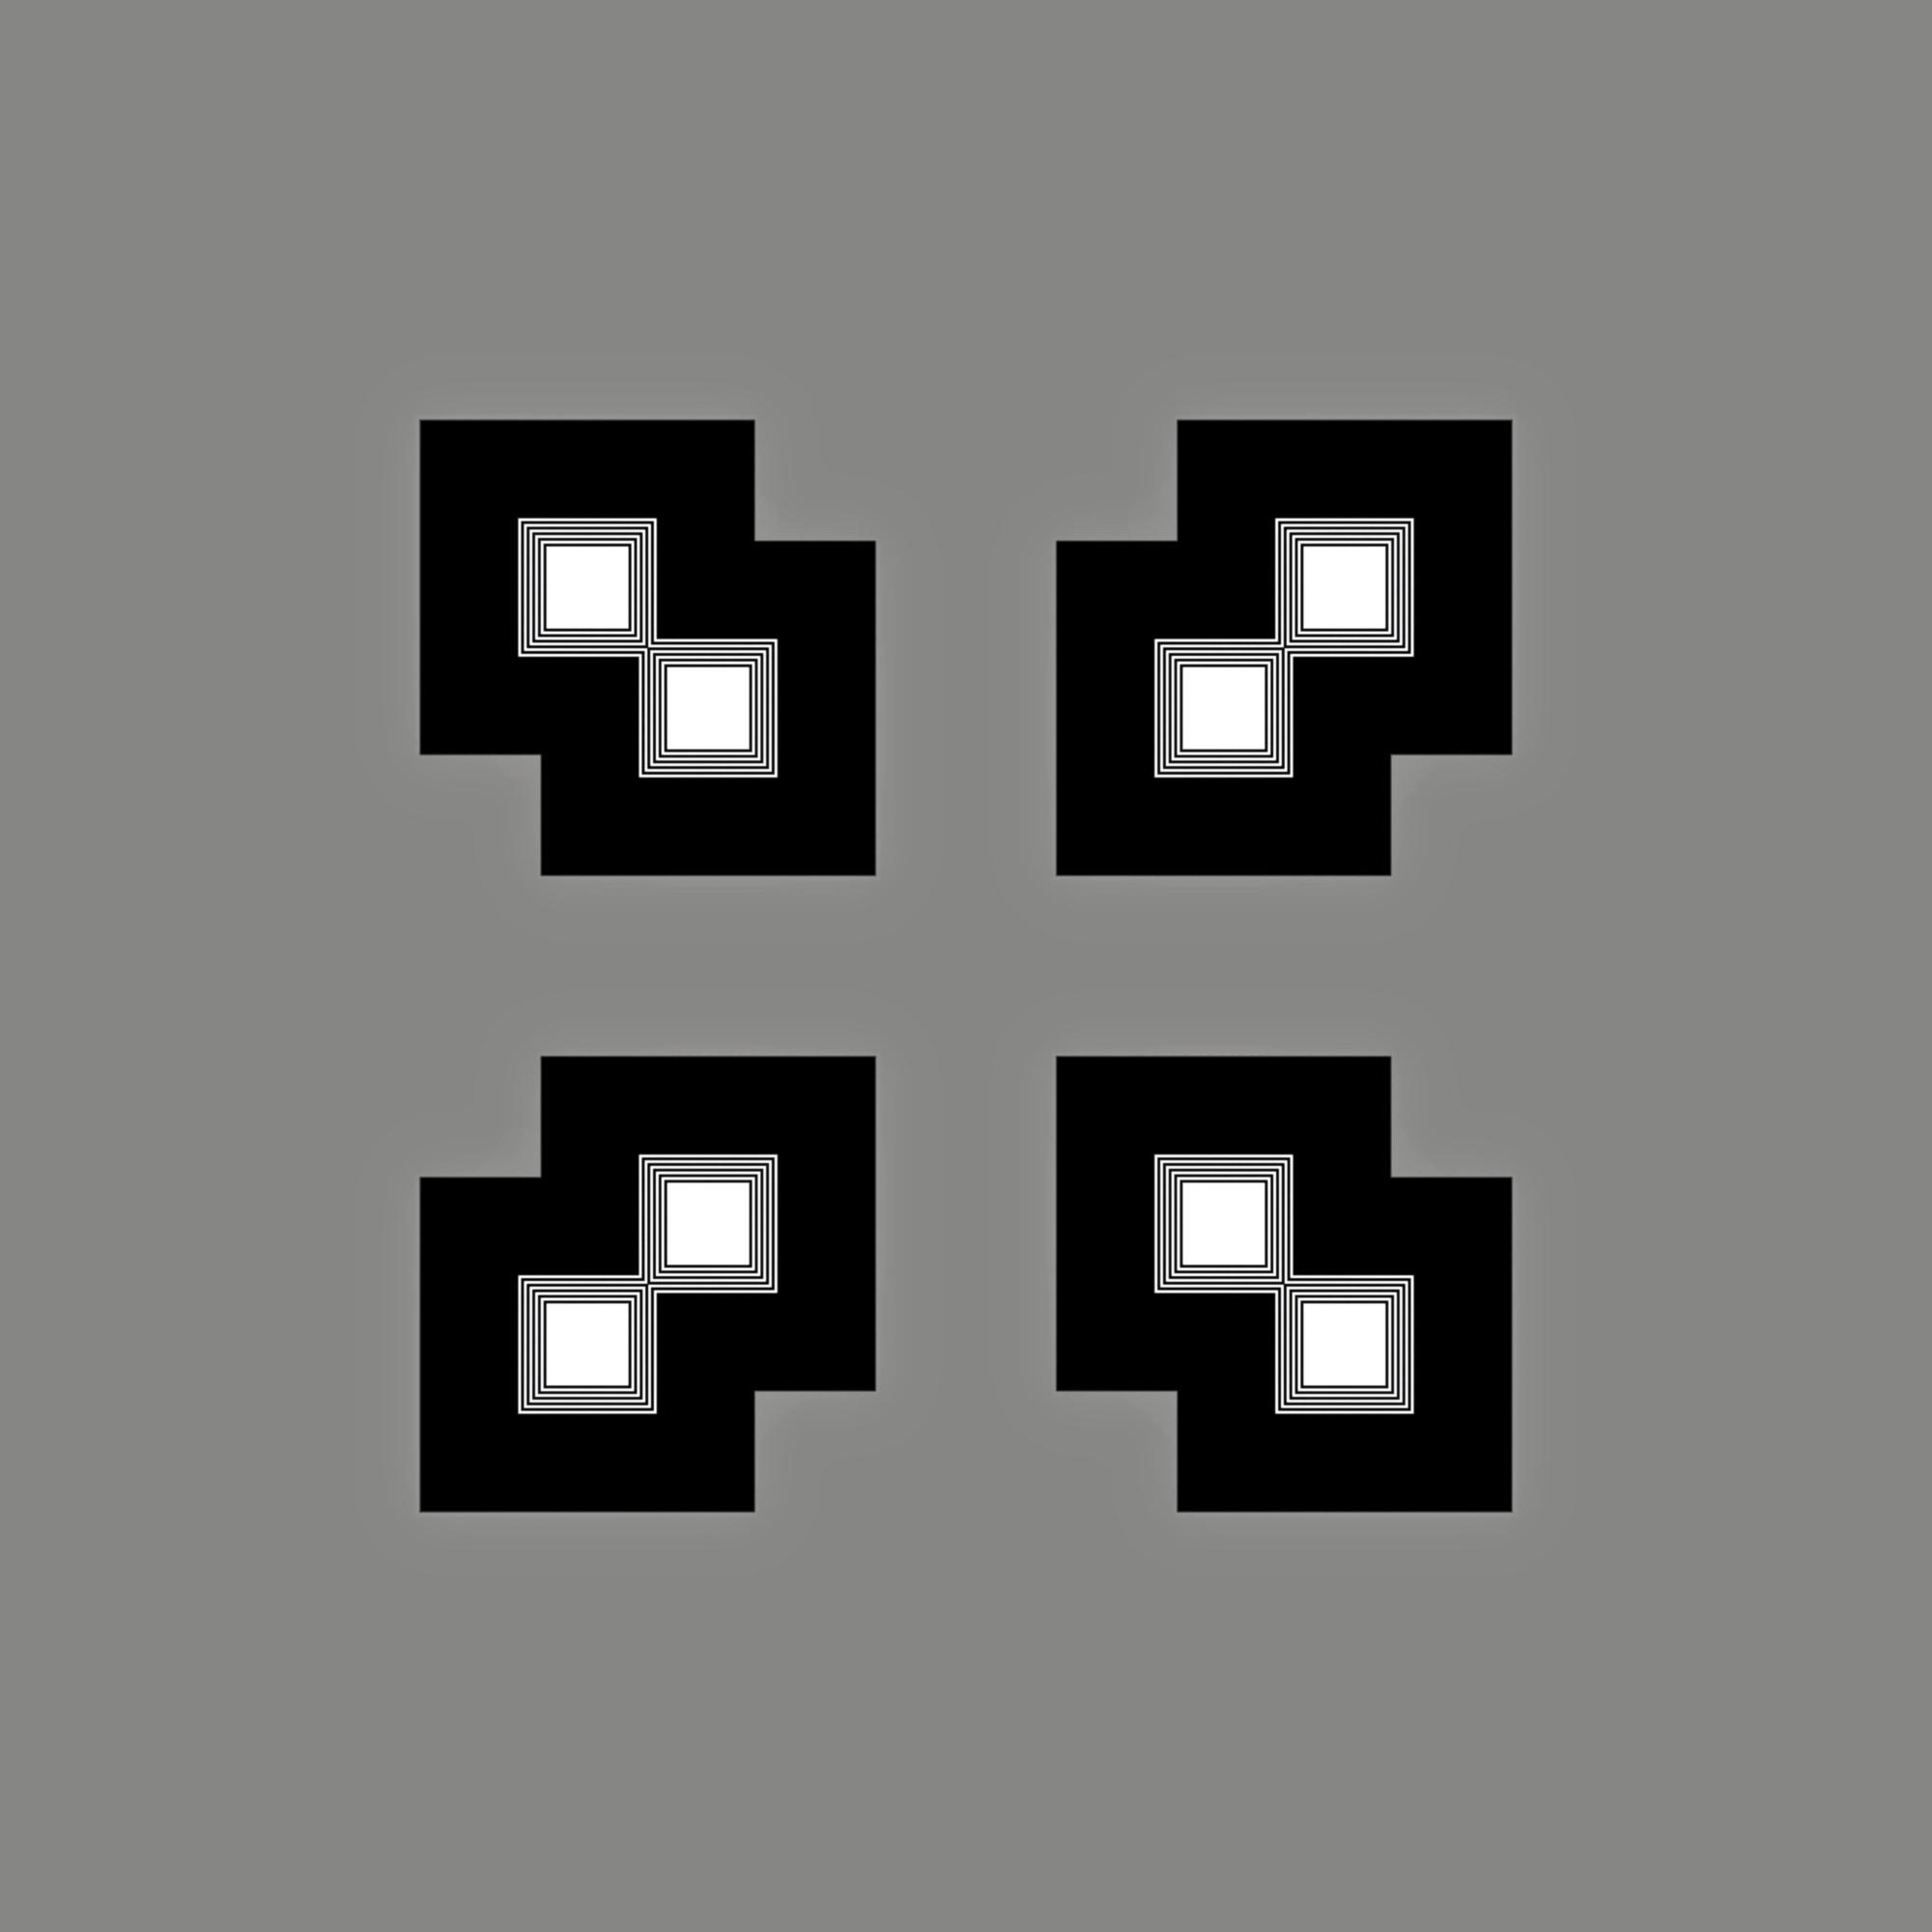 Geometrics 02